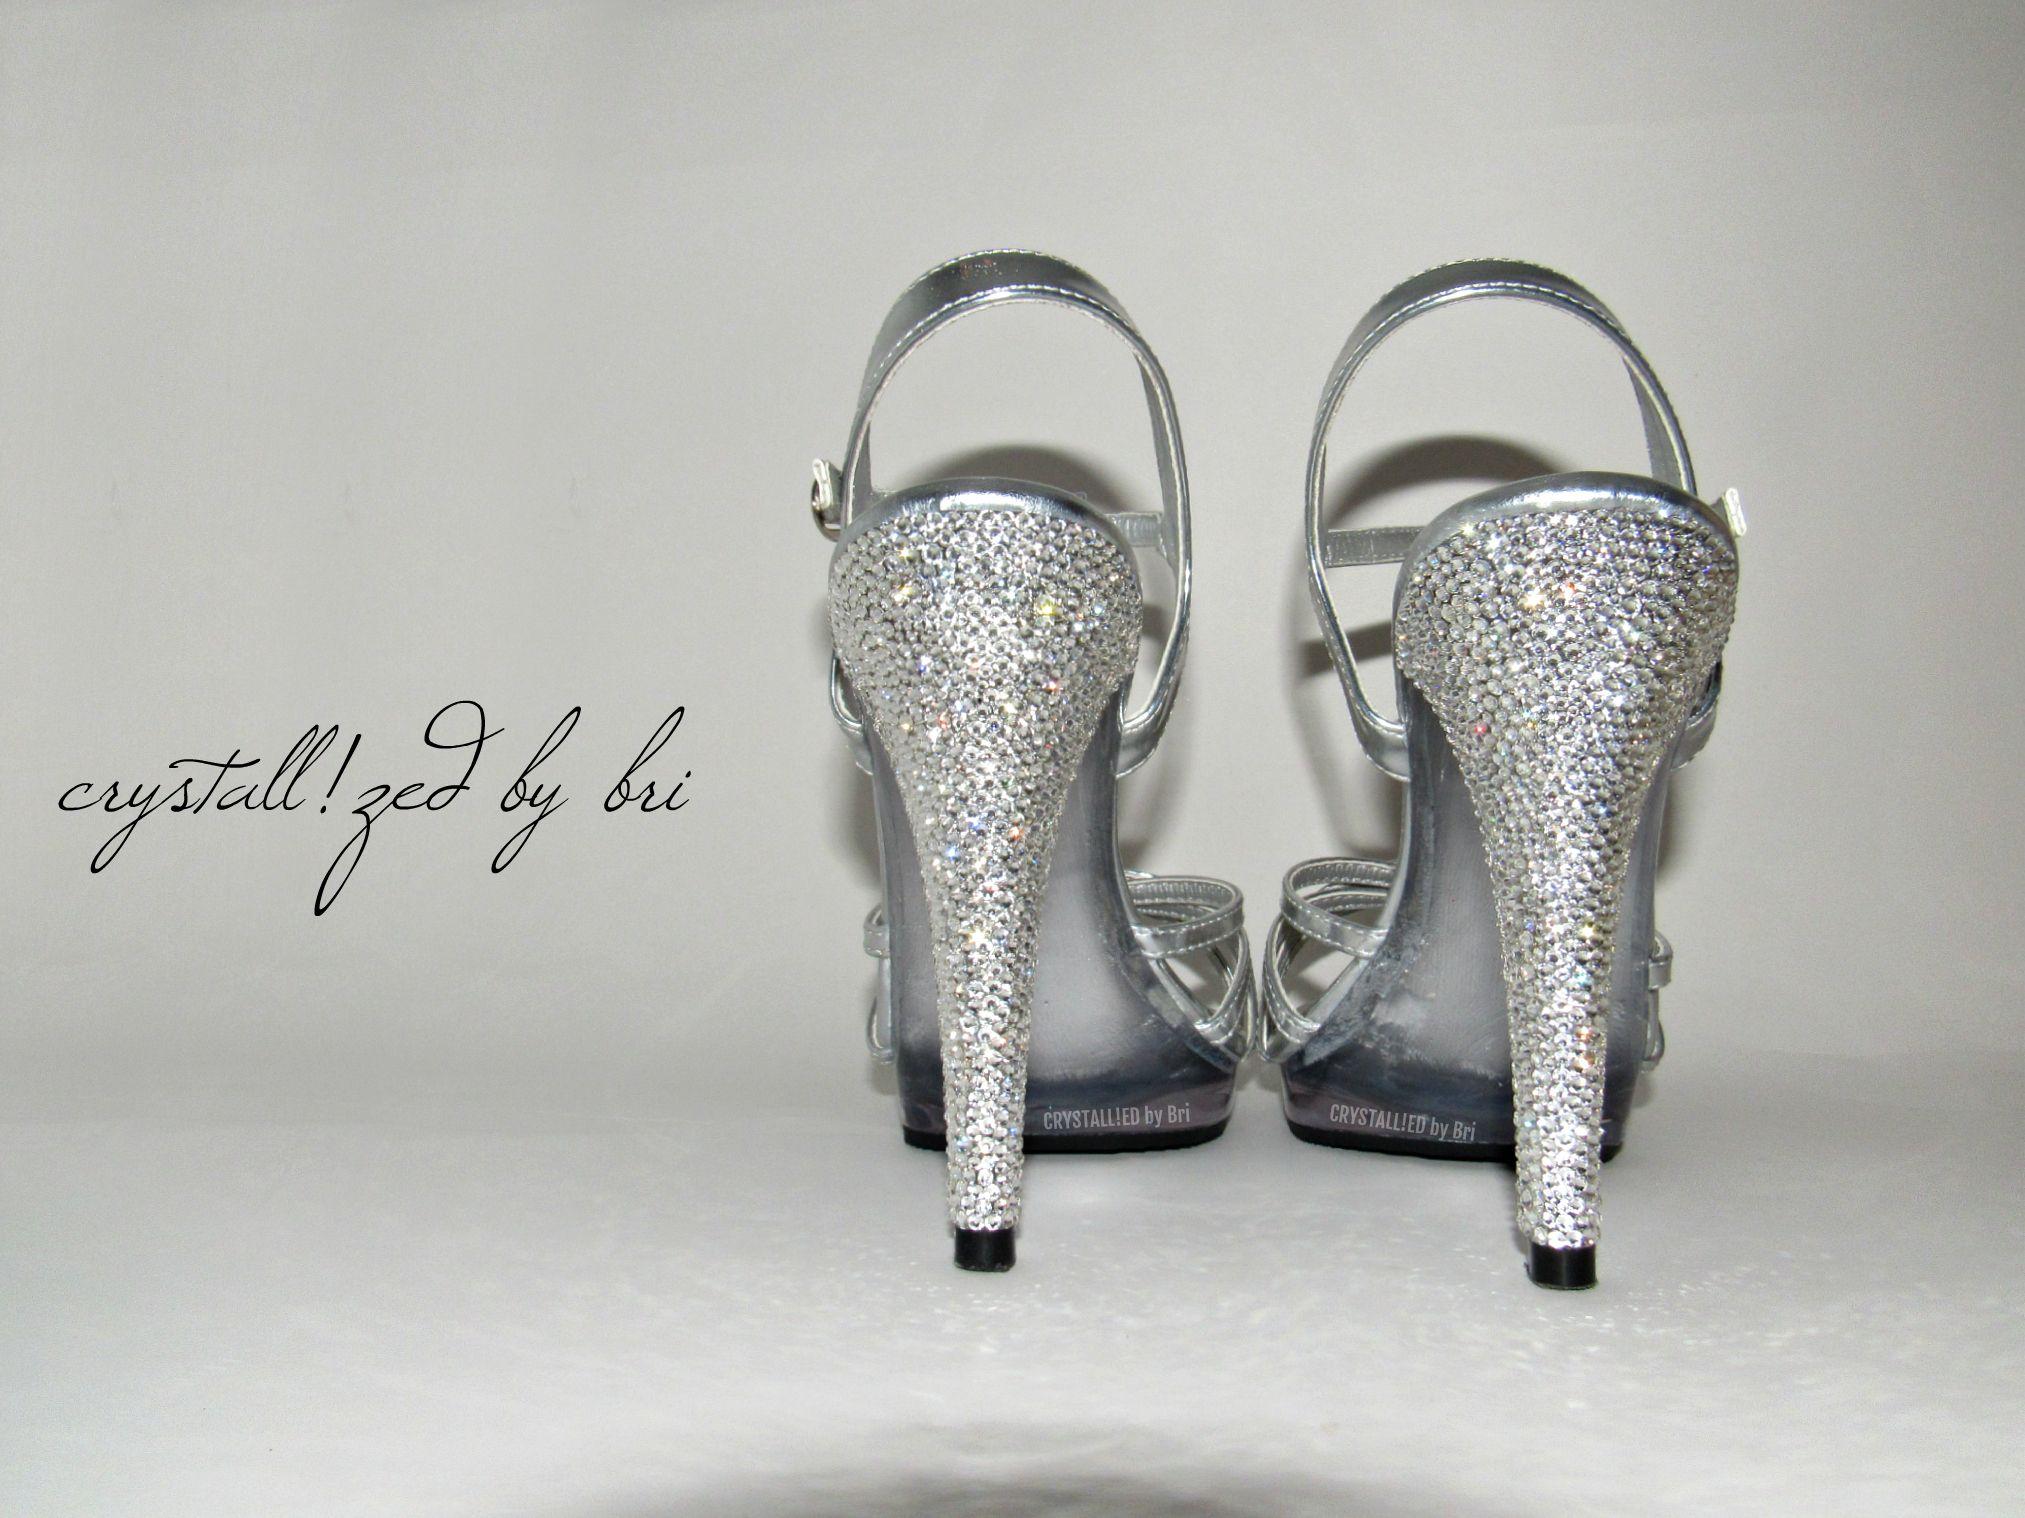 cdb596da62 Custom Made Crystallized Stiletto Heels Made With Swarovski Crystals -  Heels Only